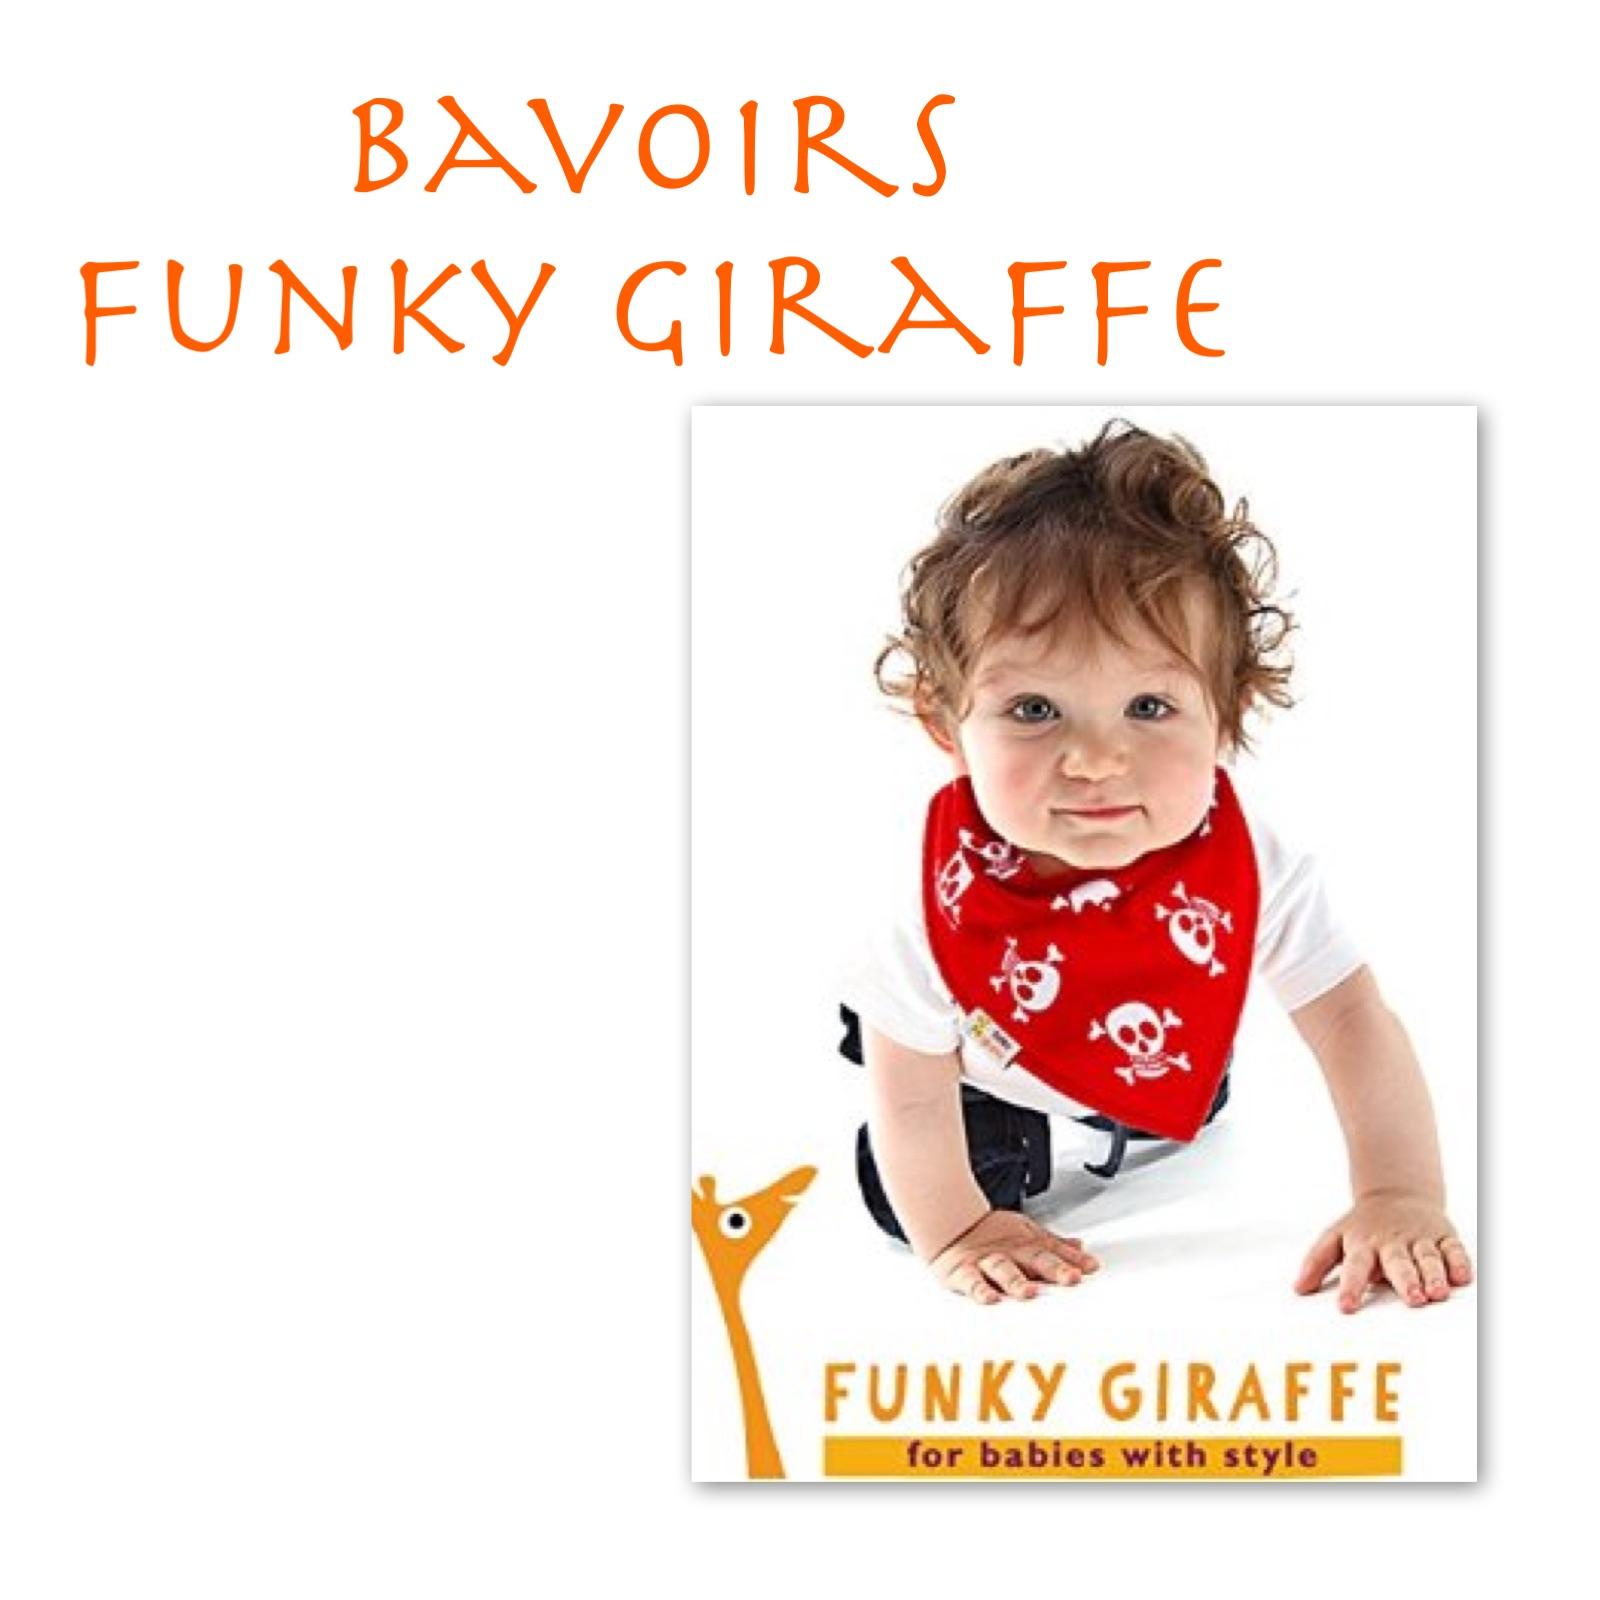 Bavoirs Funky Giraffe